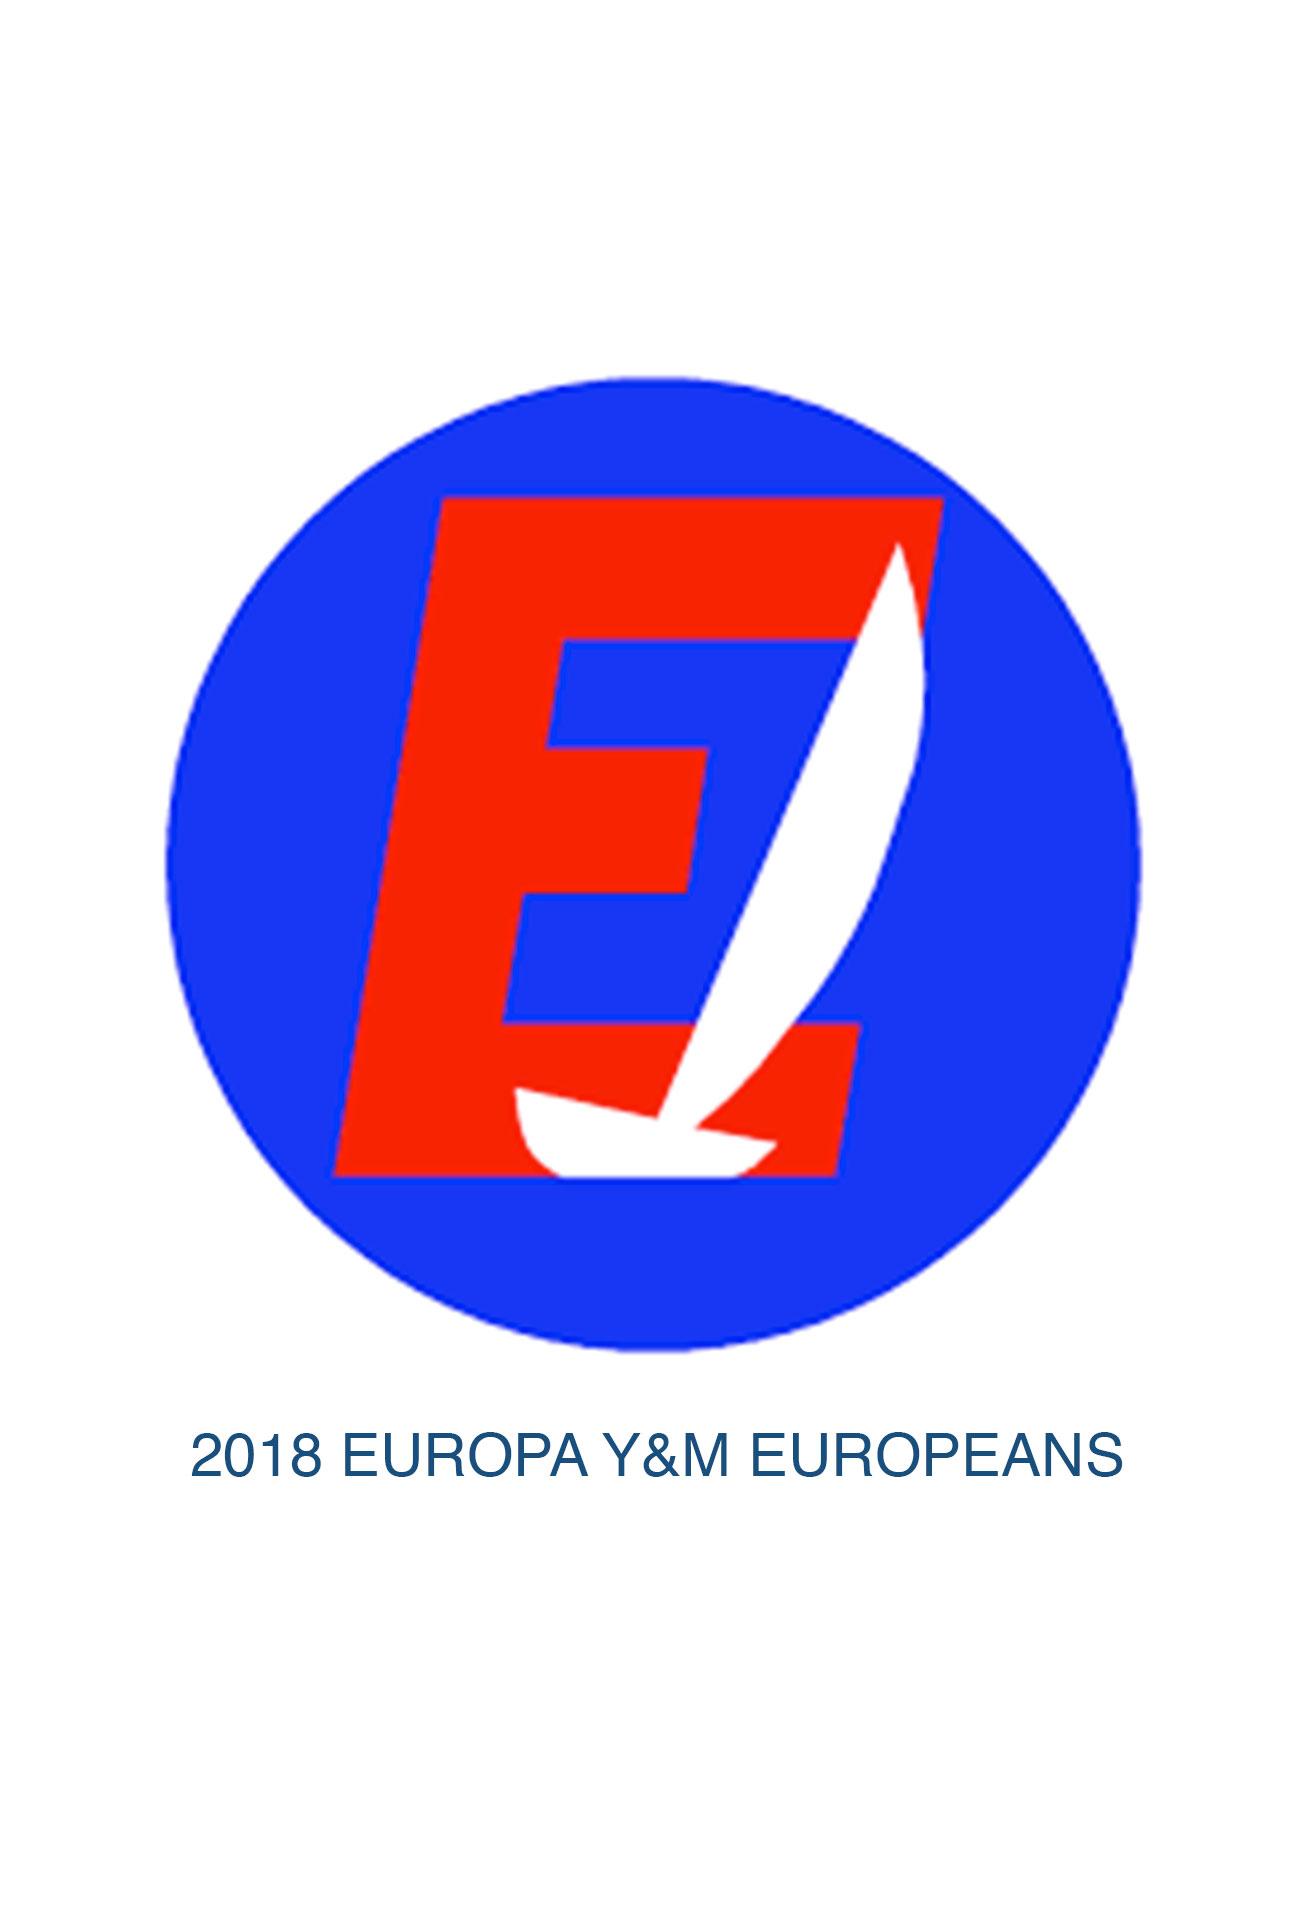 europa-ym-europeans2018_p-elenagiolai-circolovelaarco